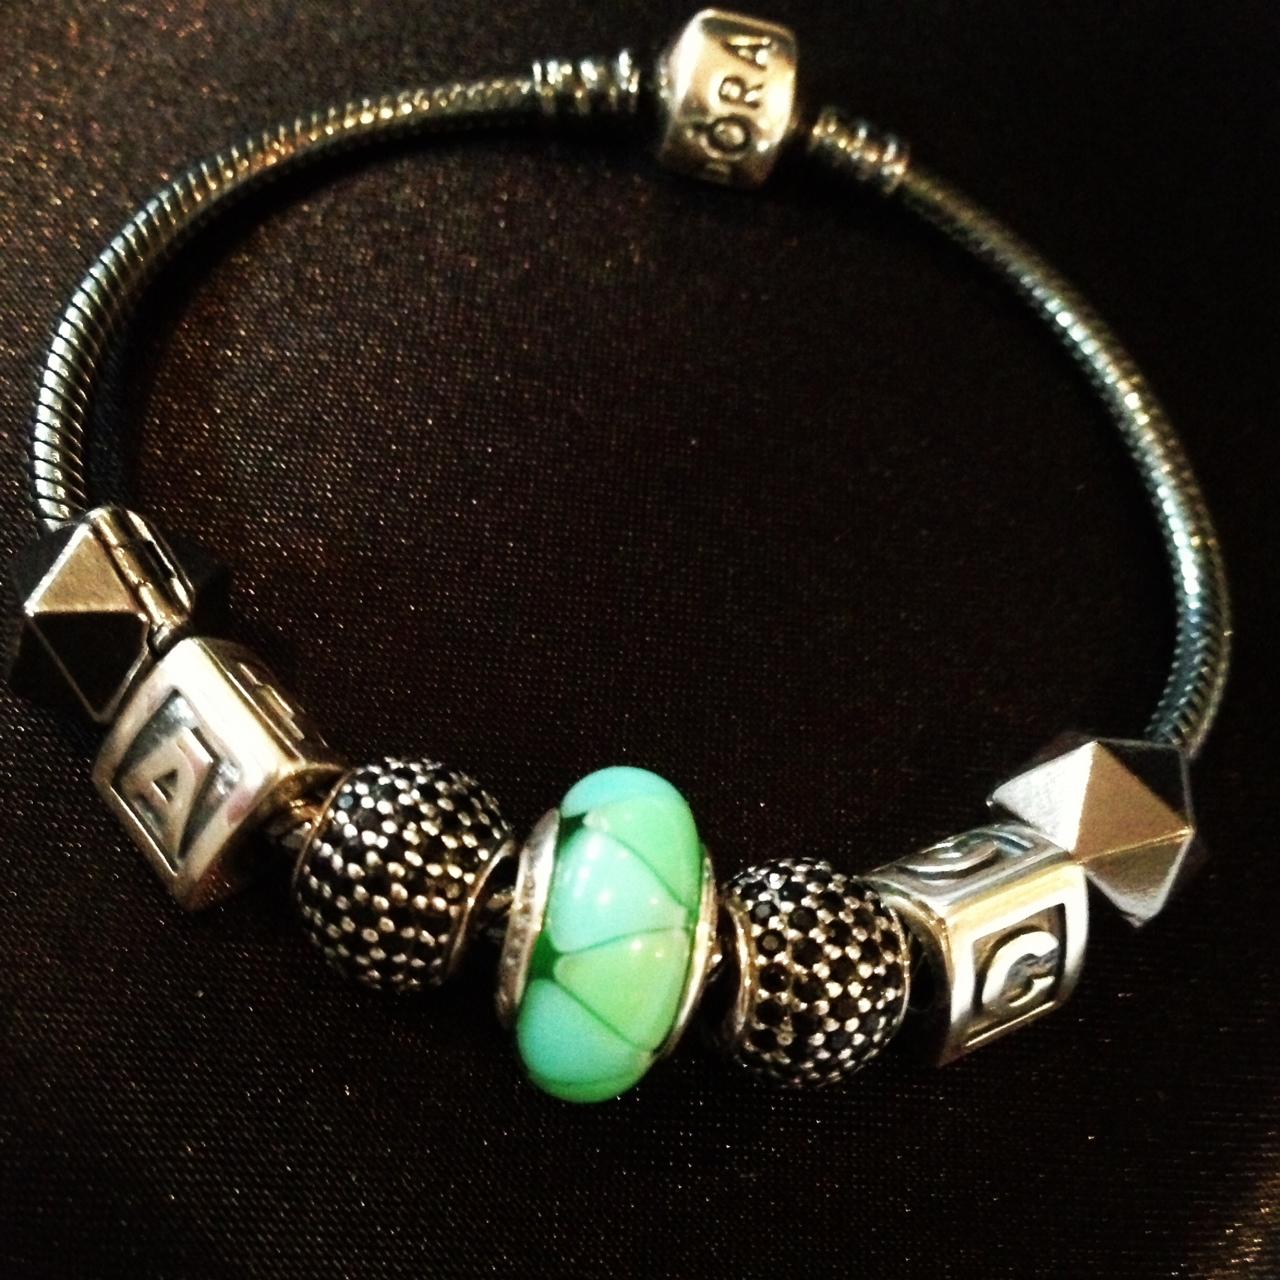 Pandora Mens Jewelry: Do Men Wear Pandora Bracelets